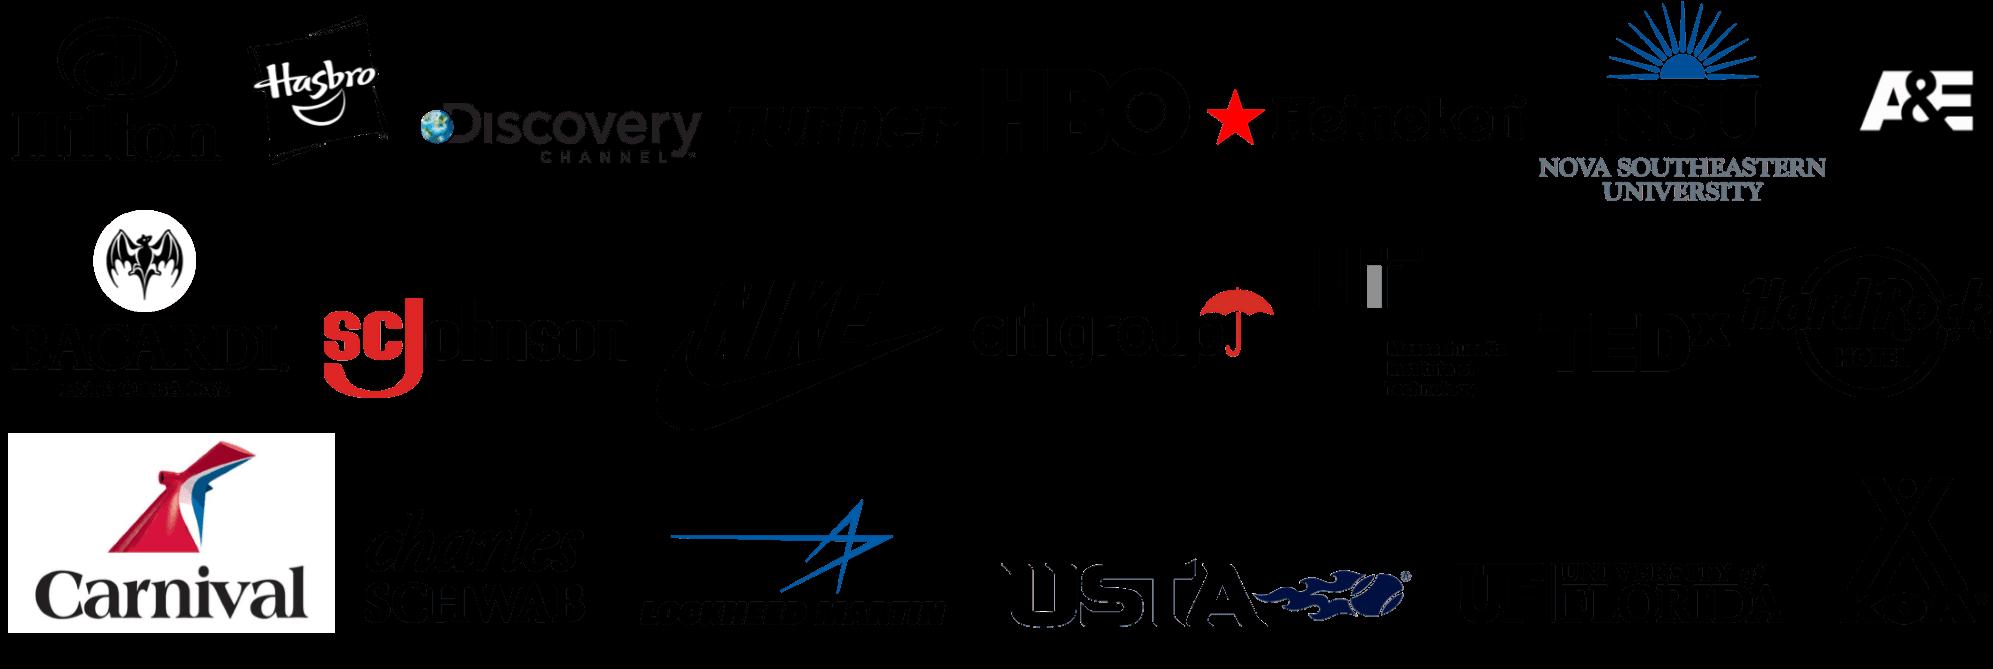 Bruce's Client's Logos